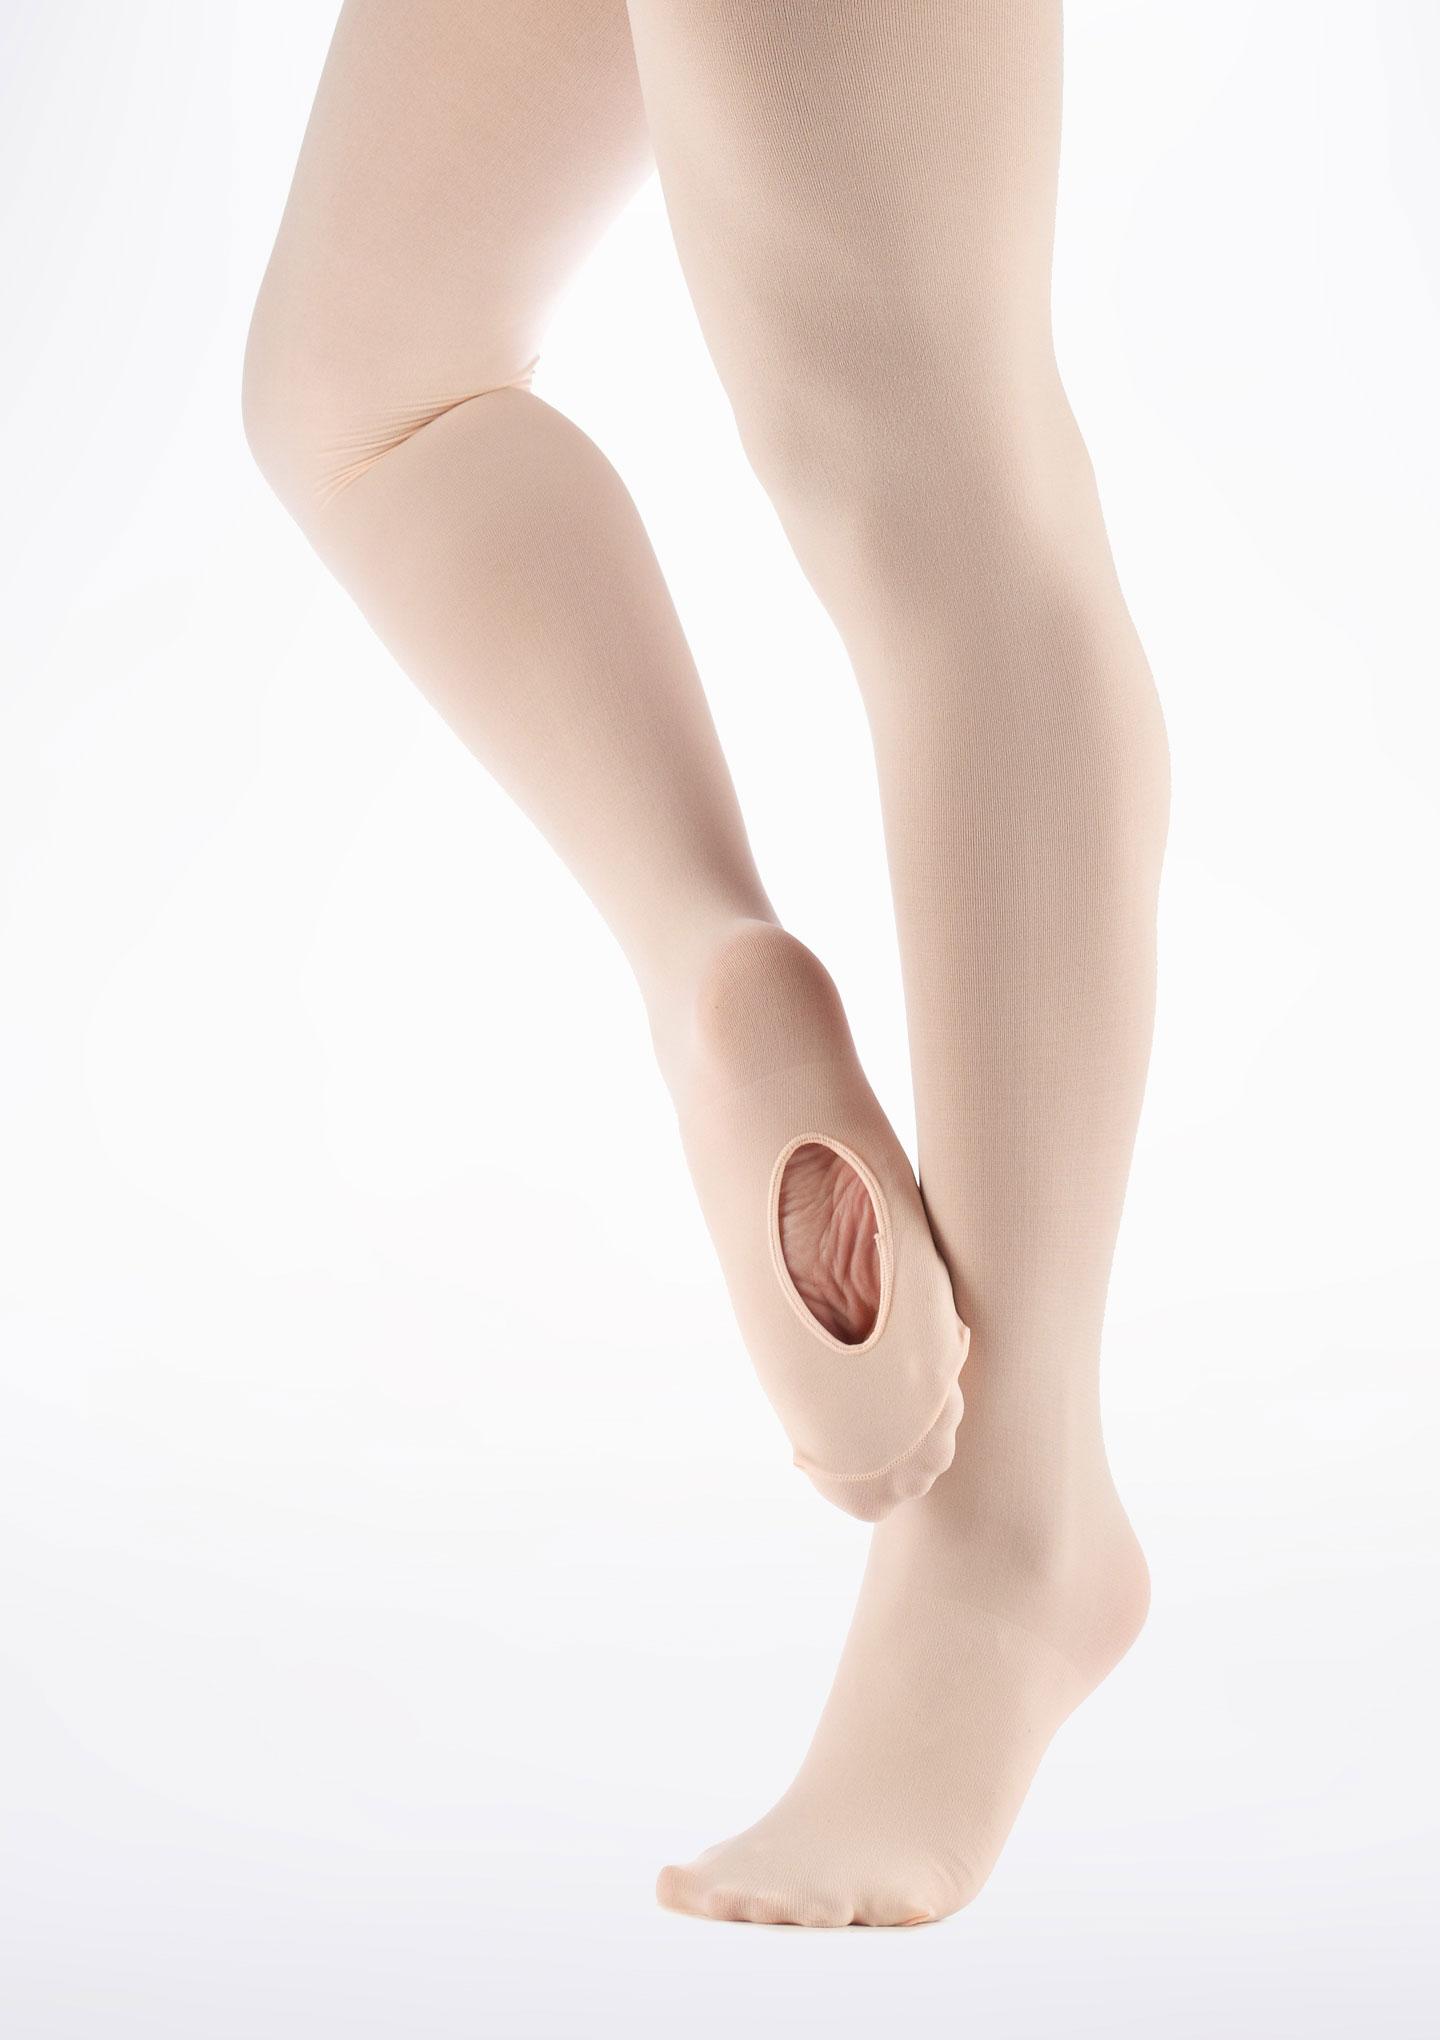 Medias Ballet Convertibles Move Dance Rossa Rosa imagen principal. [Rosa]